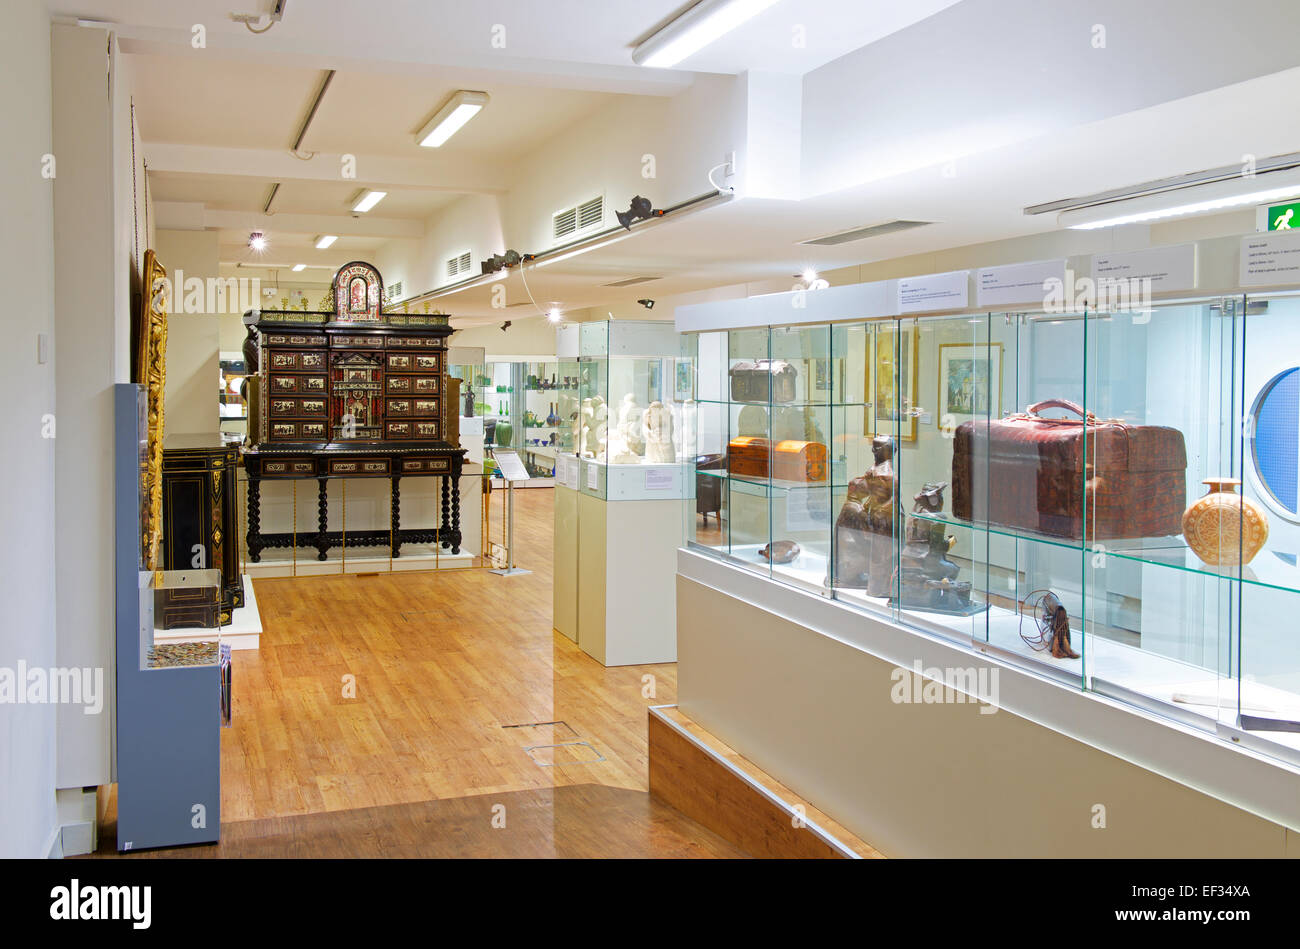 Display in the museum and art gallery, Northampton, Northamptonshire, England UK - Stock Image